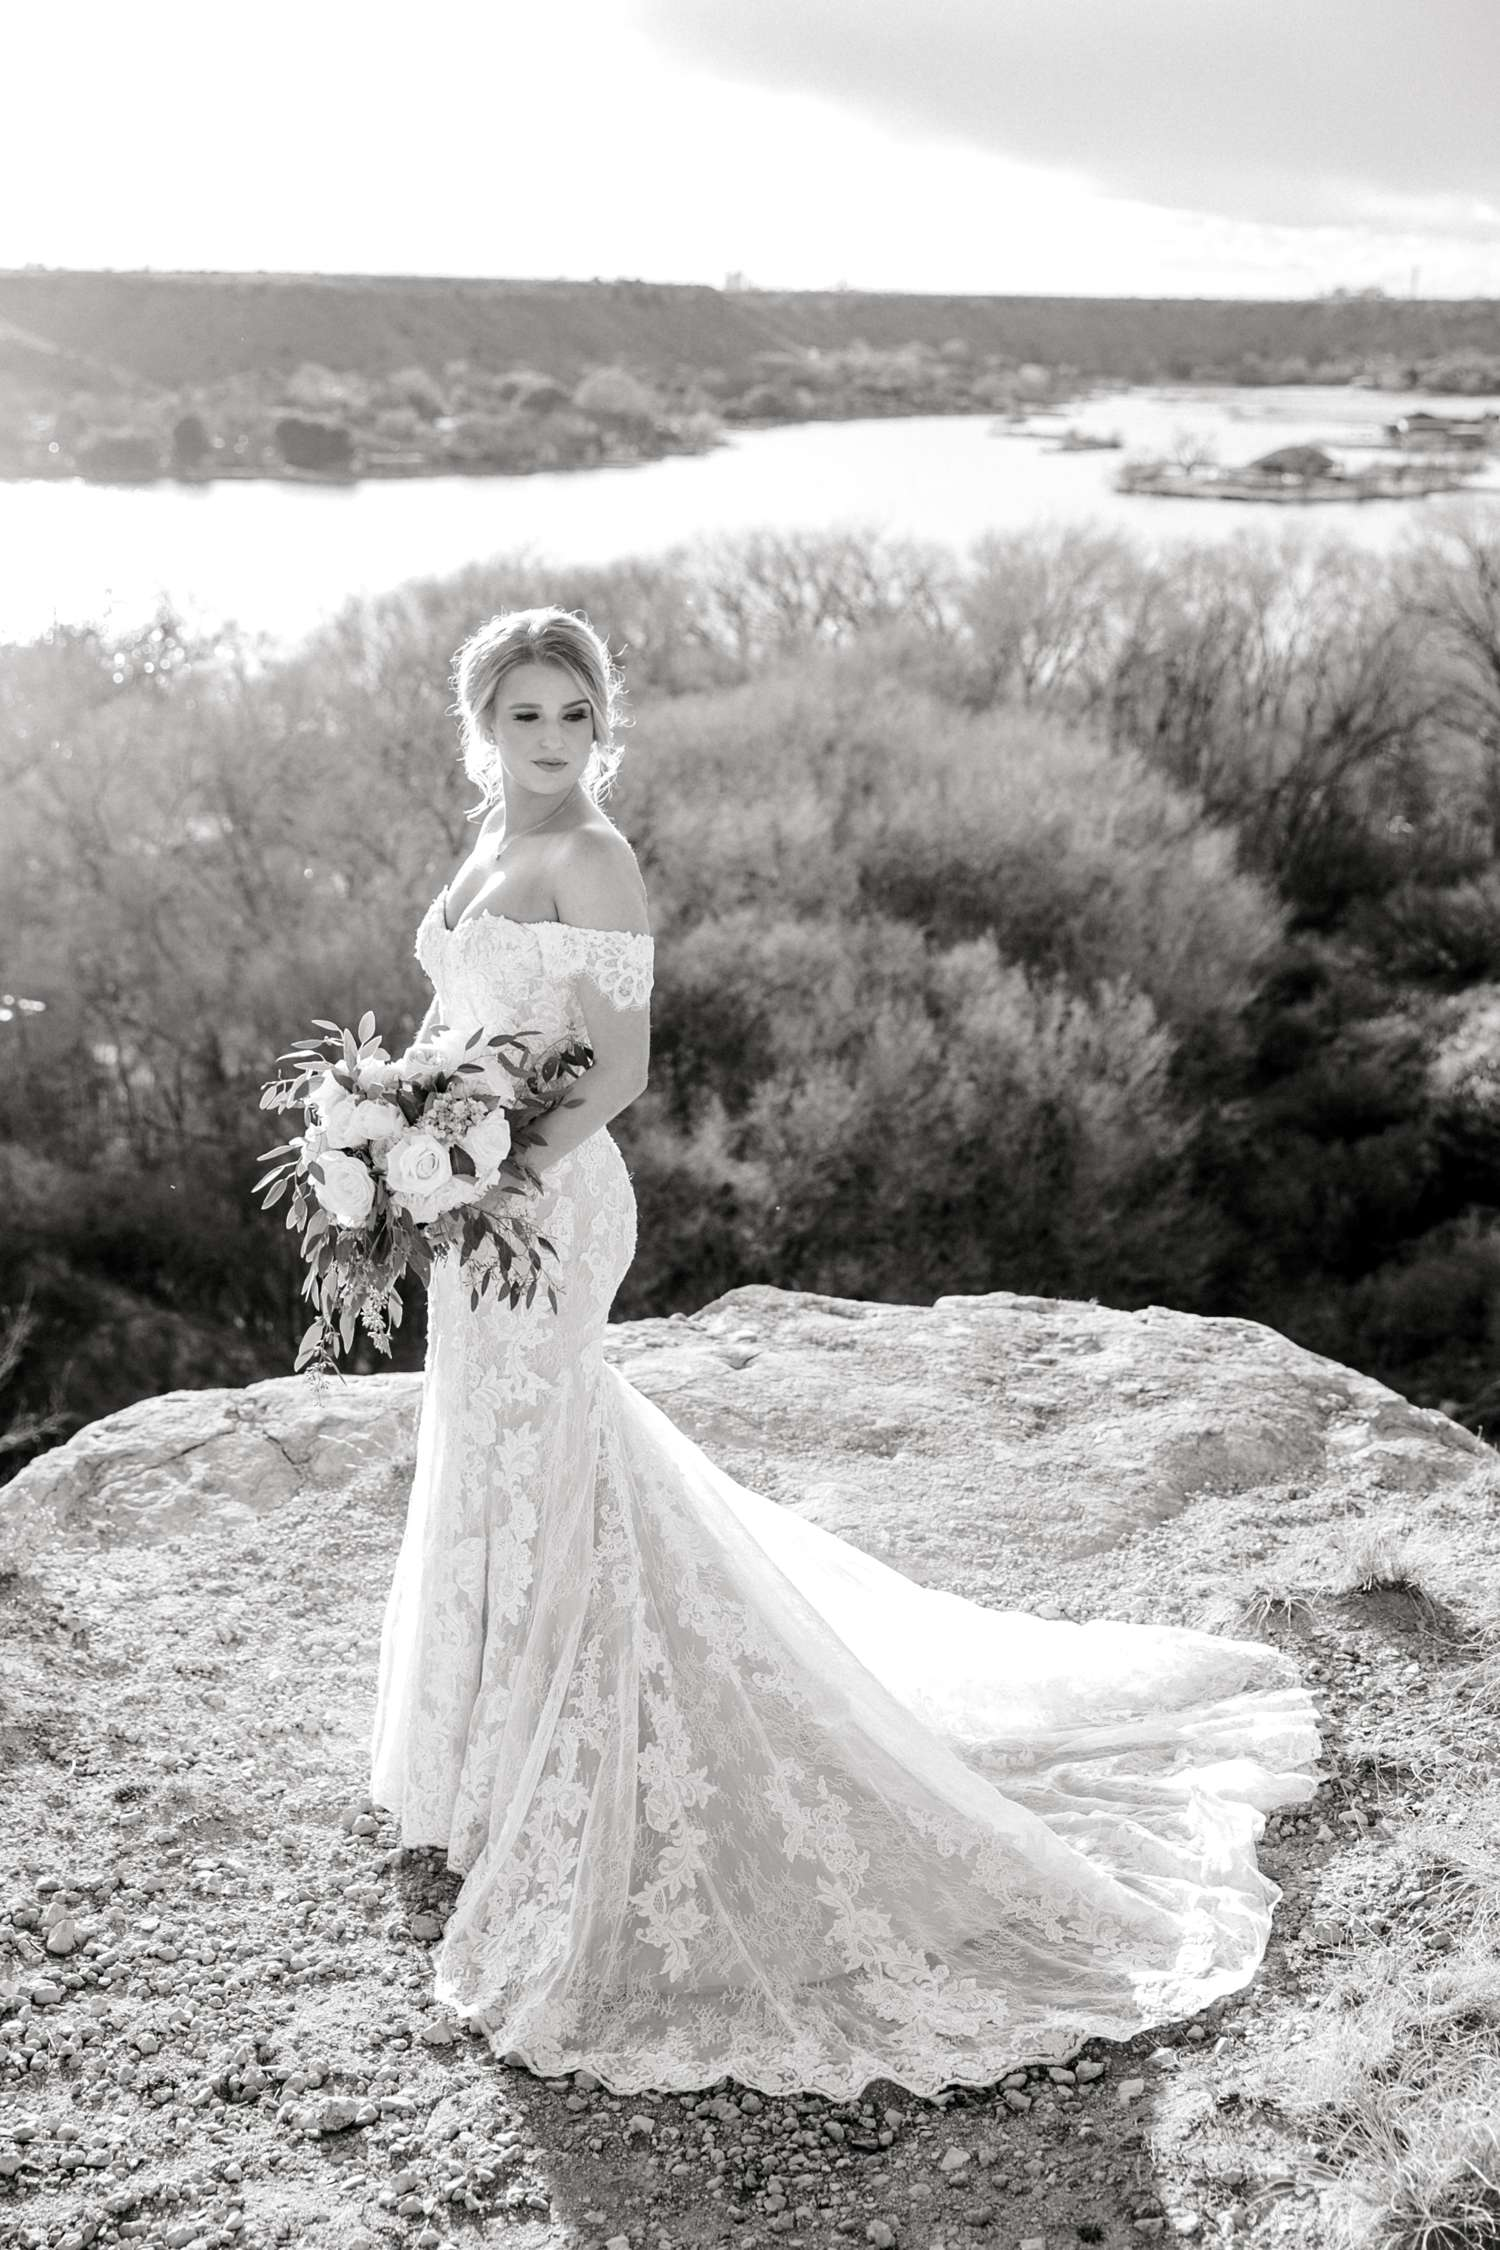 MORGAN+BOONE+BRIDALS+WEDDING+PHOTOGRAPHER_0028.jpg